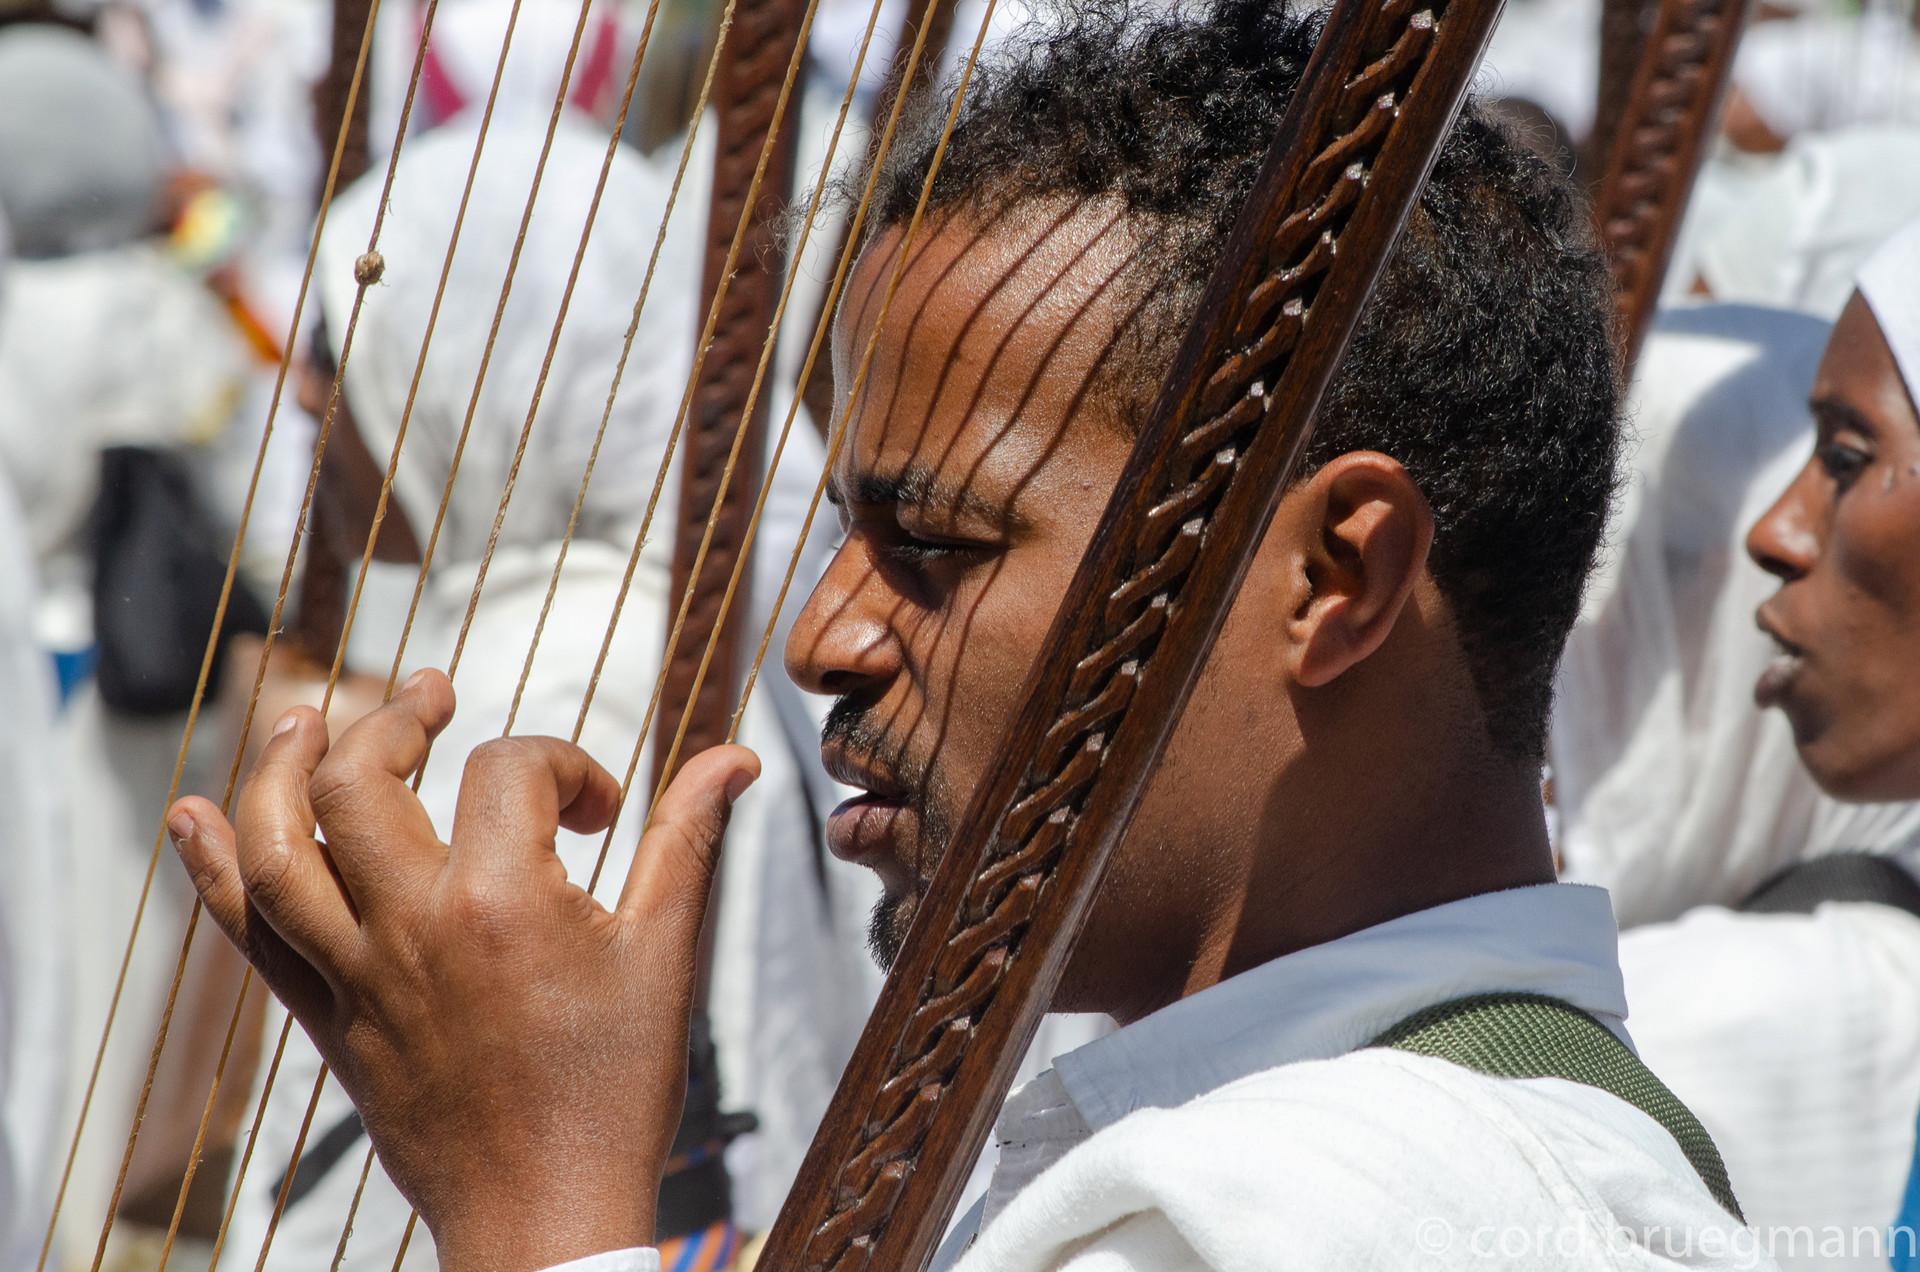 Timkat Addis Ababa 2019 CordBruegmann_34